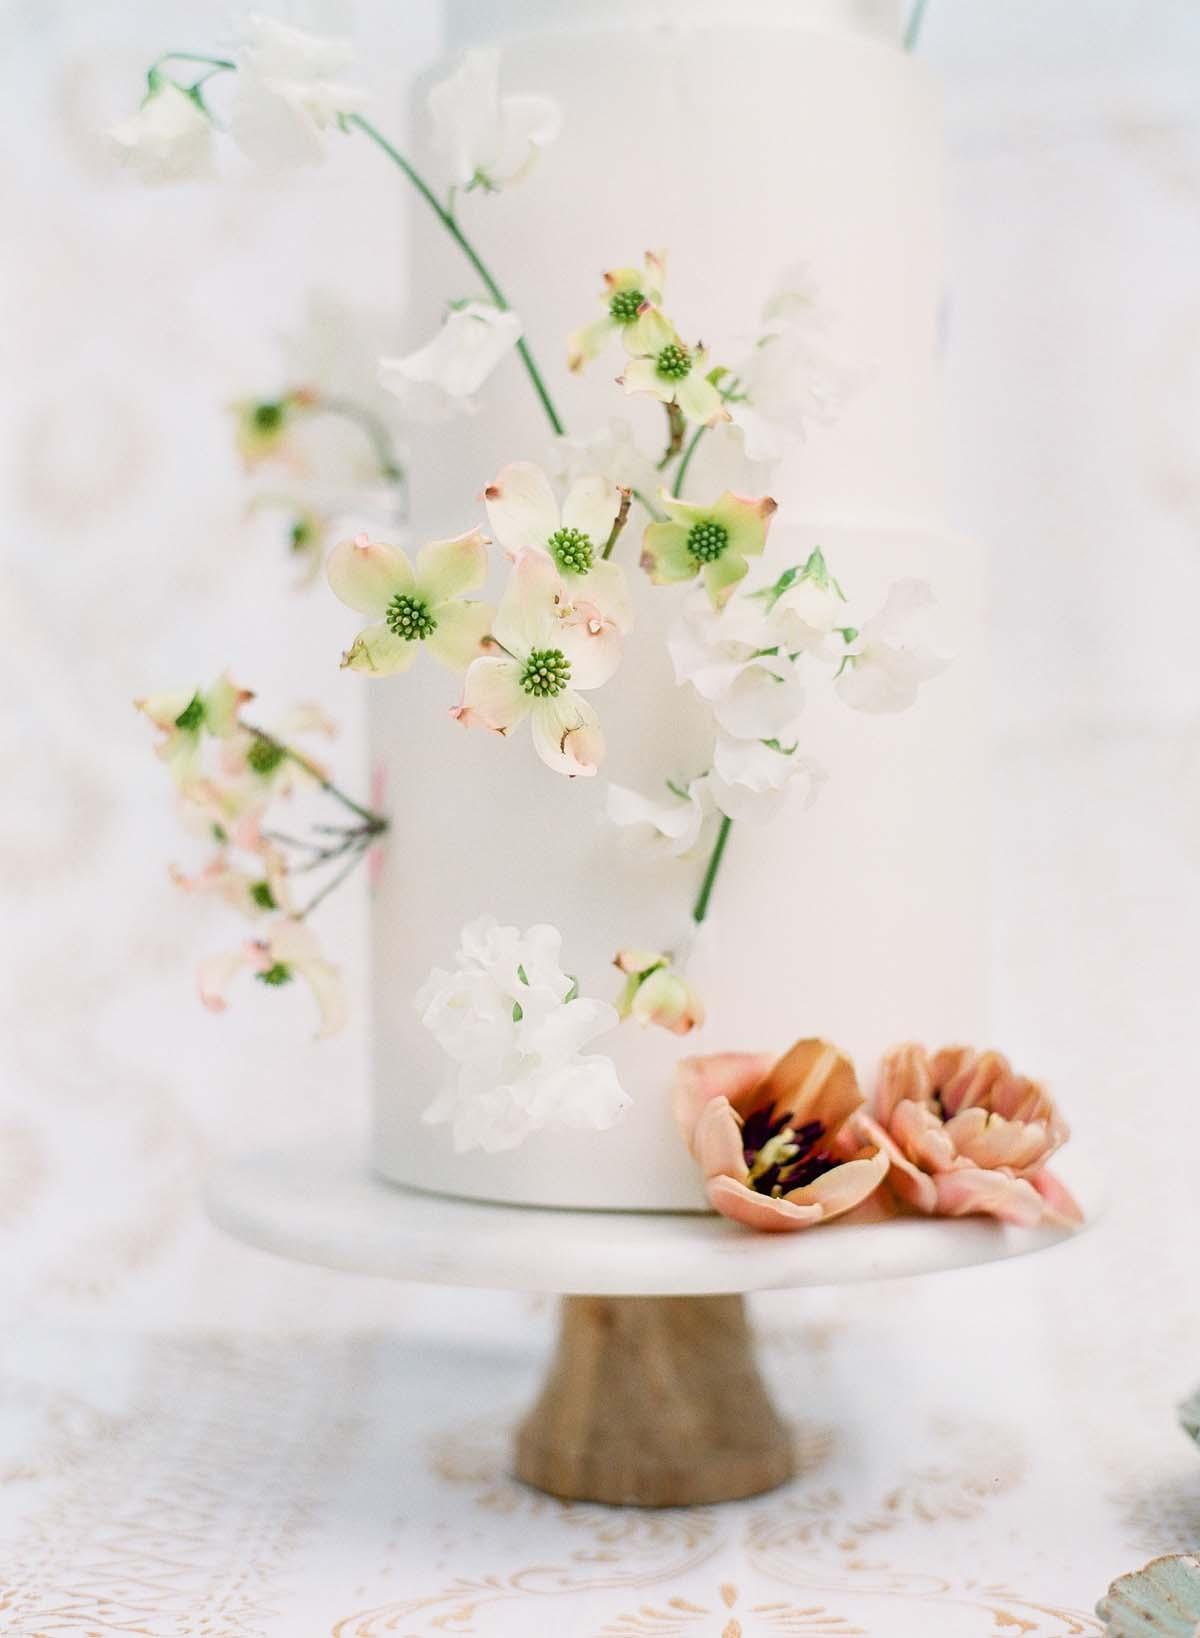 XOXO_BRIDE_Events-Michelle-Beller_Photography_0108